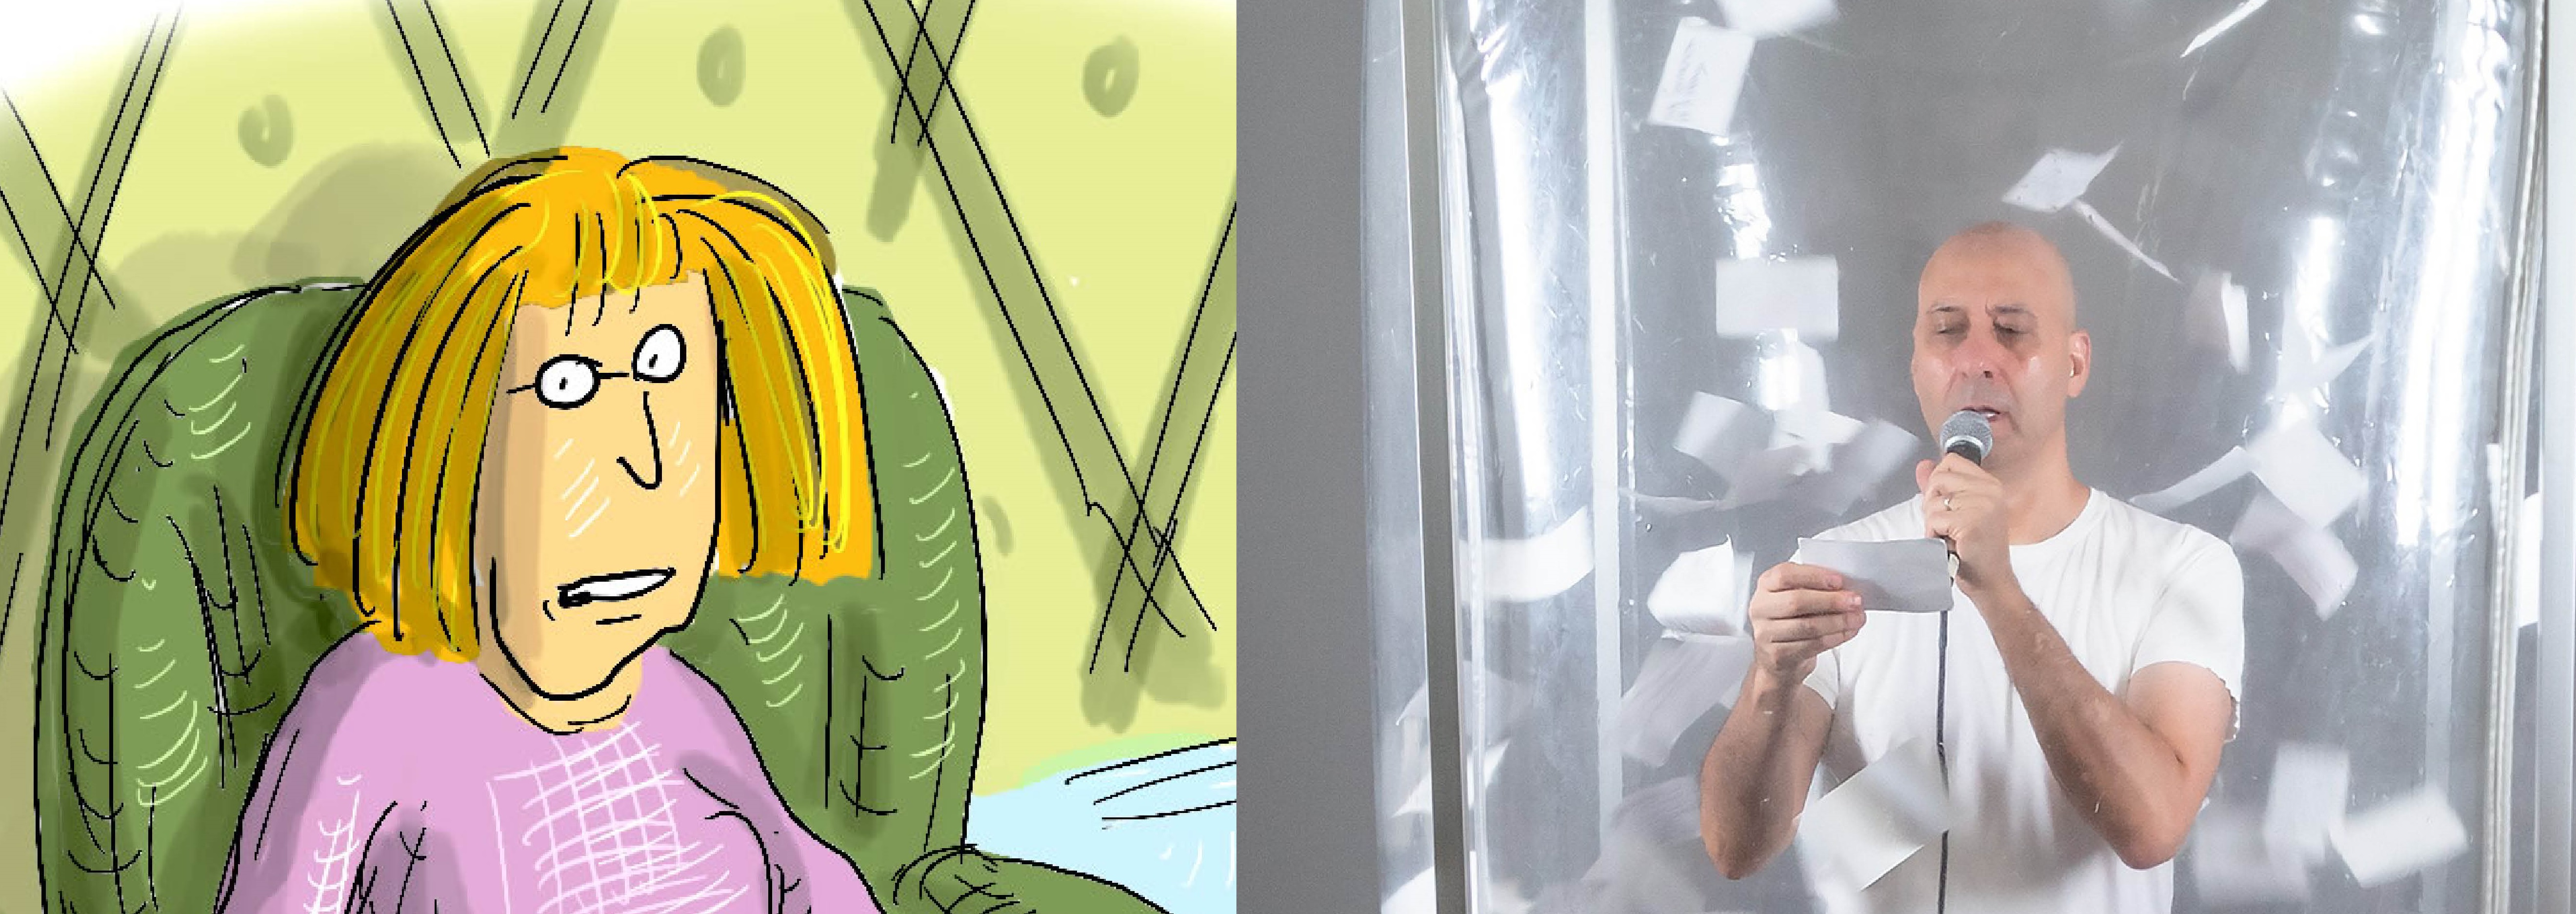 Roz Chast cartoon, self portrait in a chair, Neil Goldberg